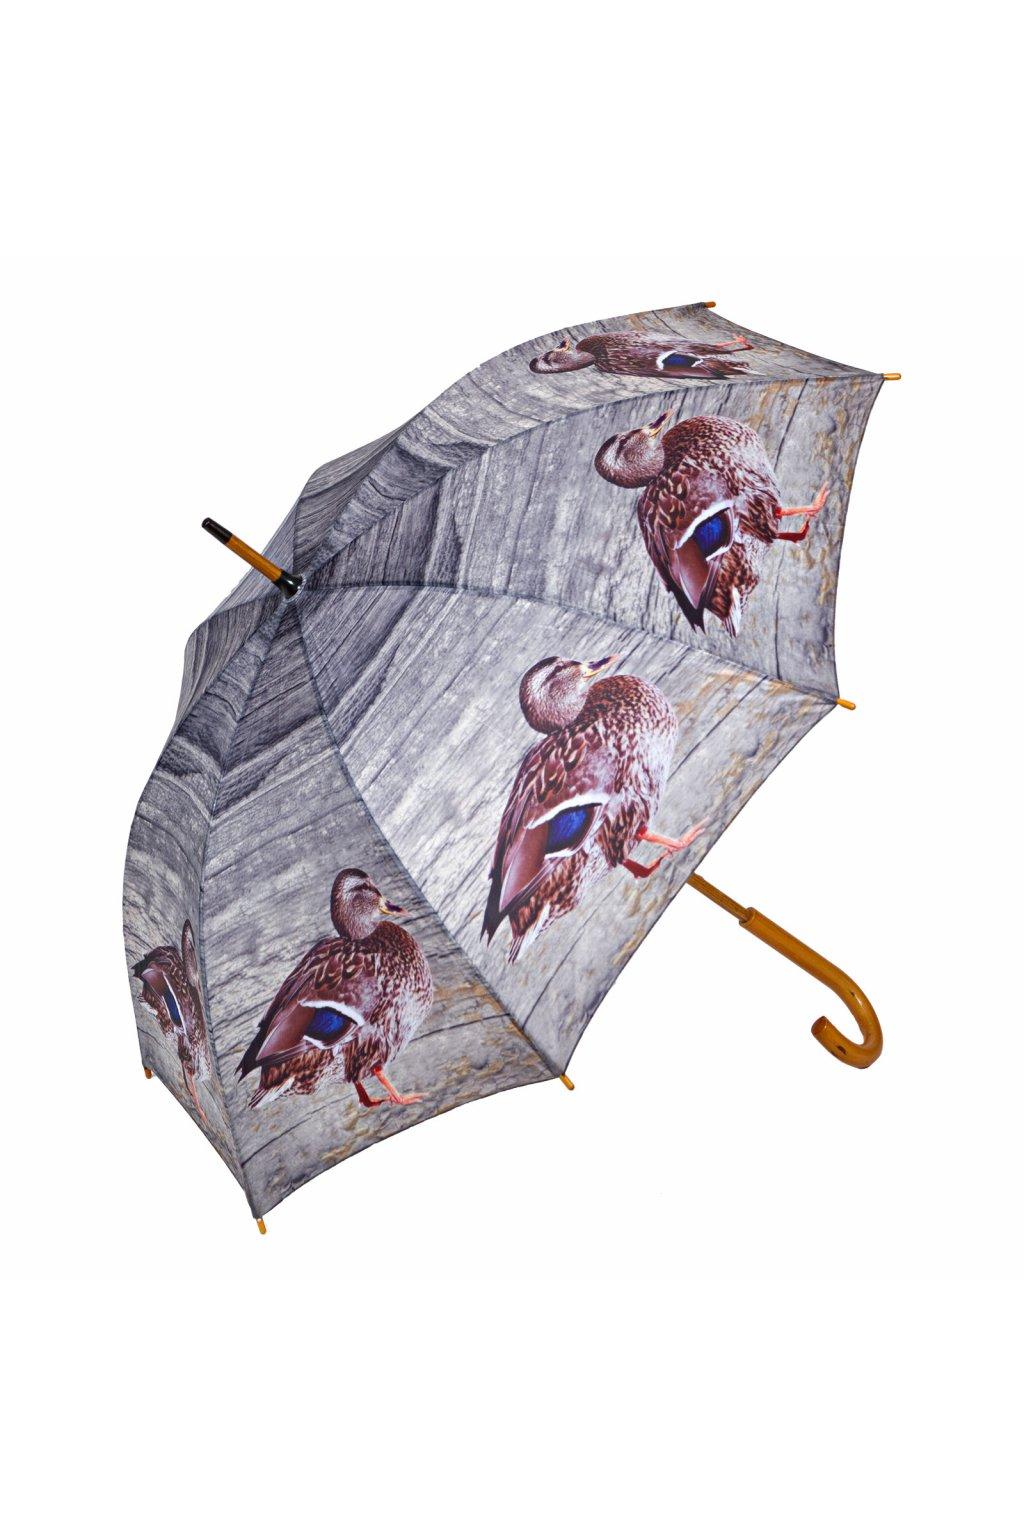 Deštník - kachna divoká